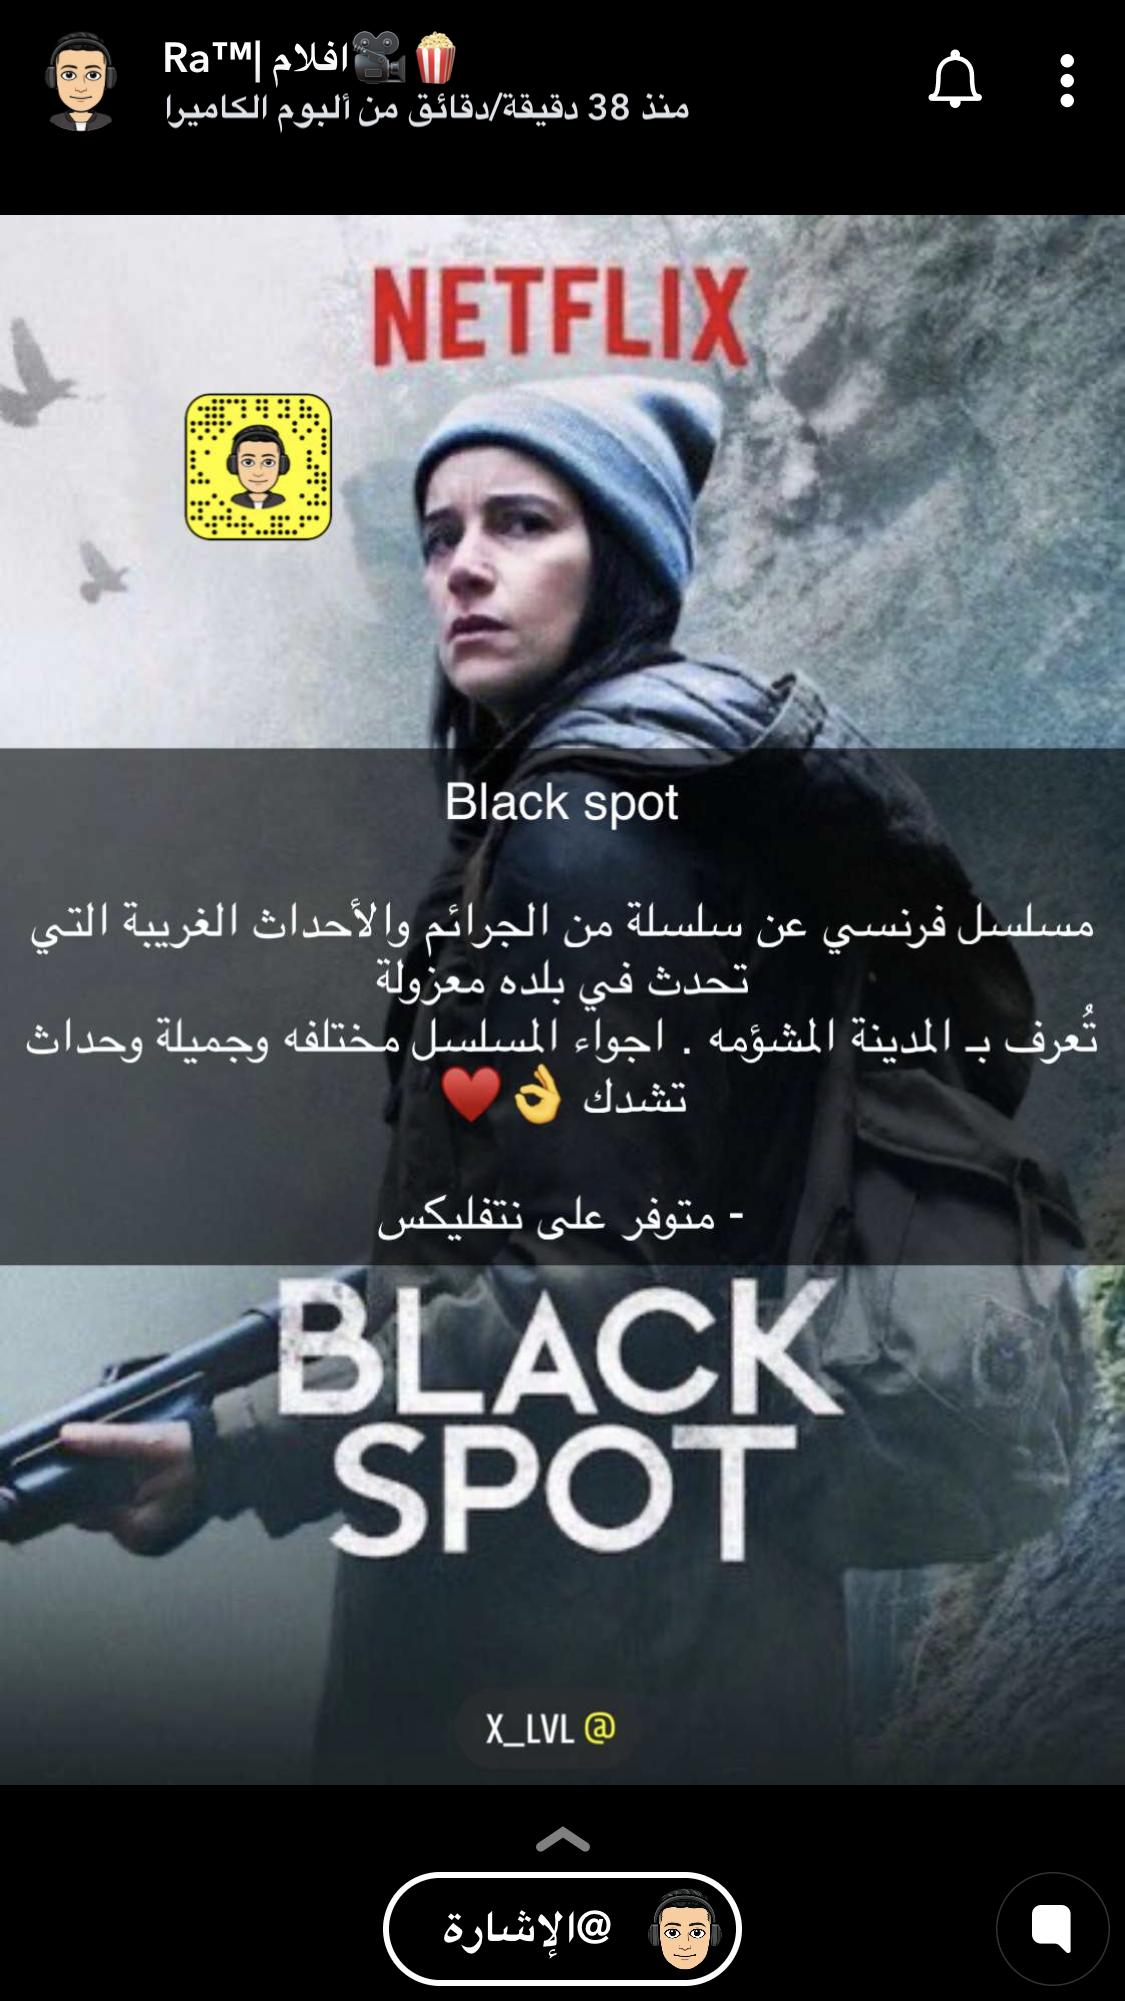 Pin By Maryam Mohamed On افلام Netflix Poster Black Spot